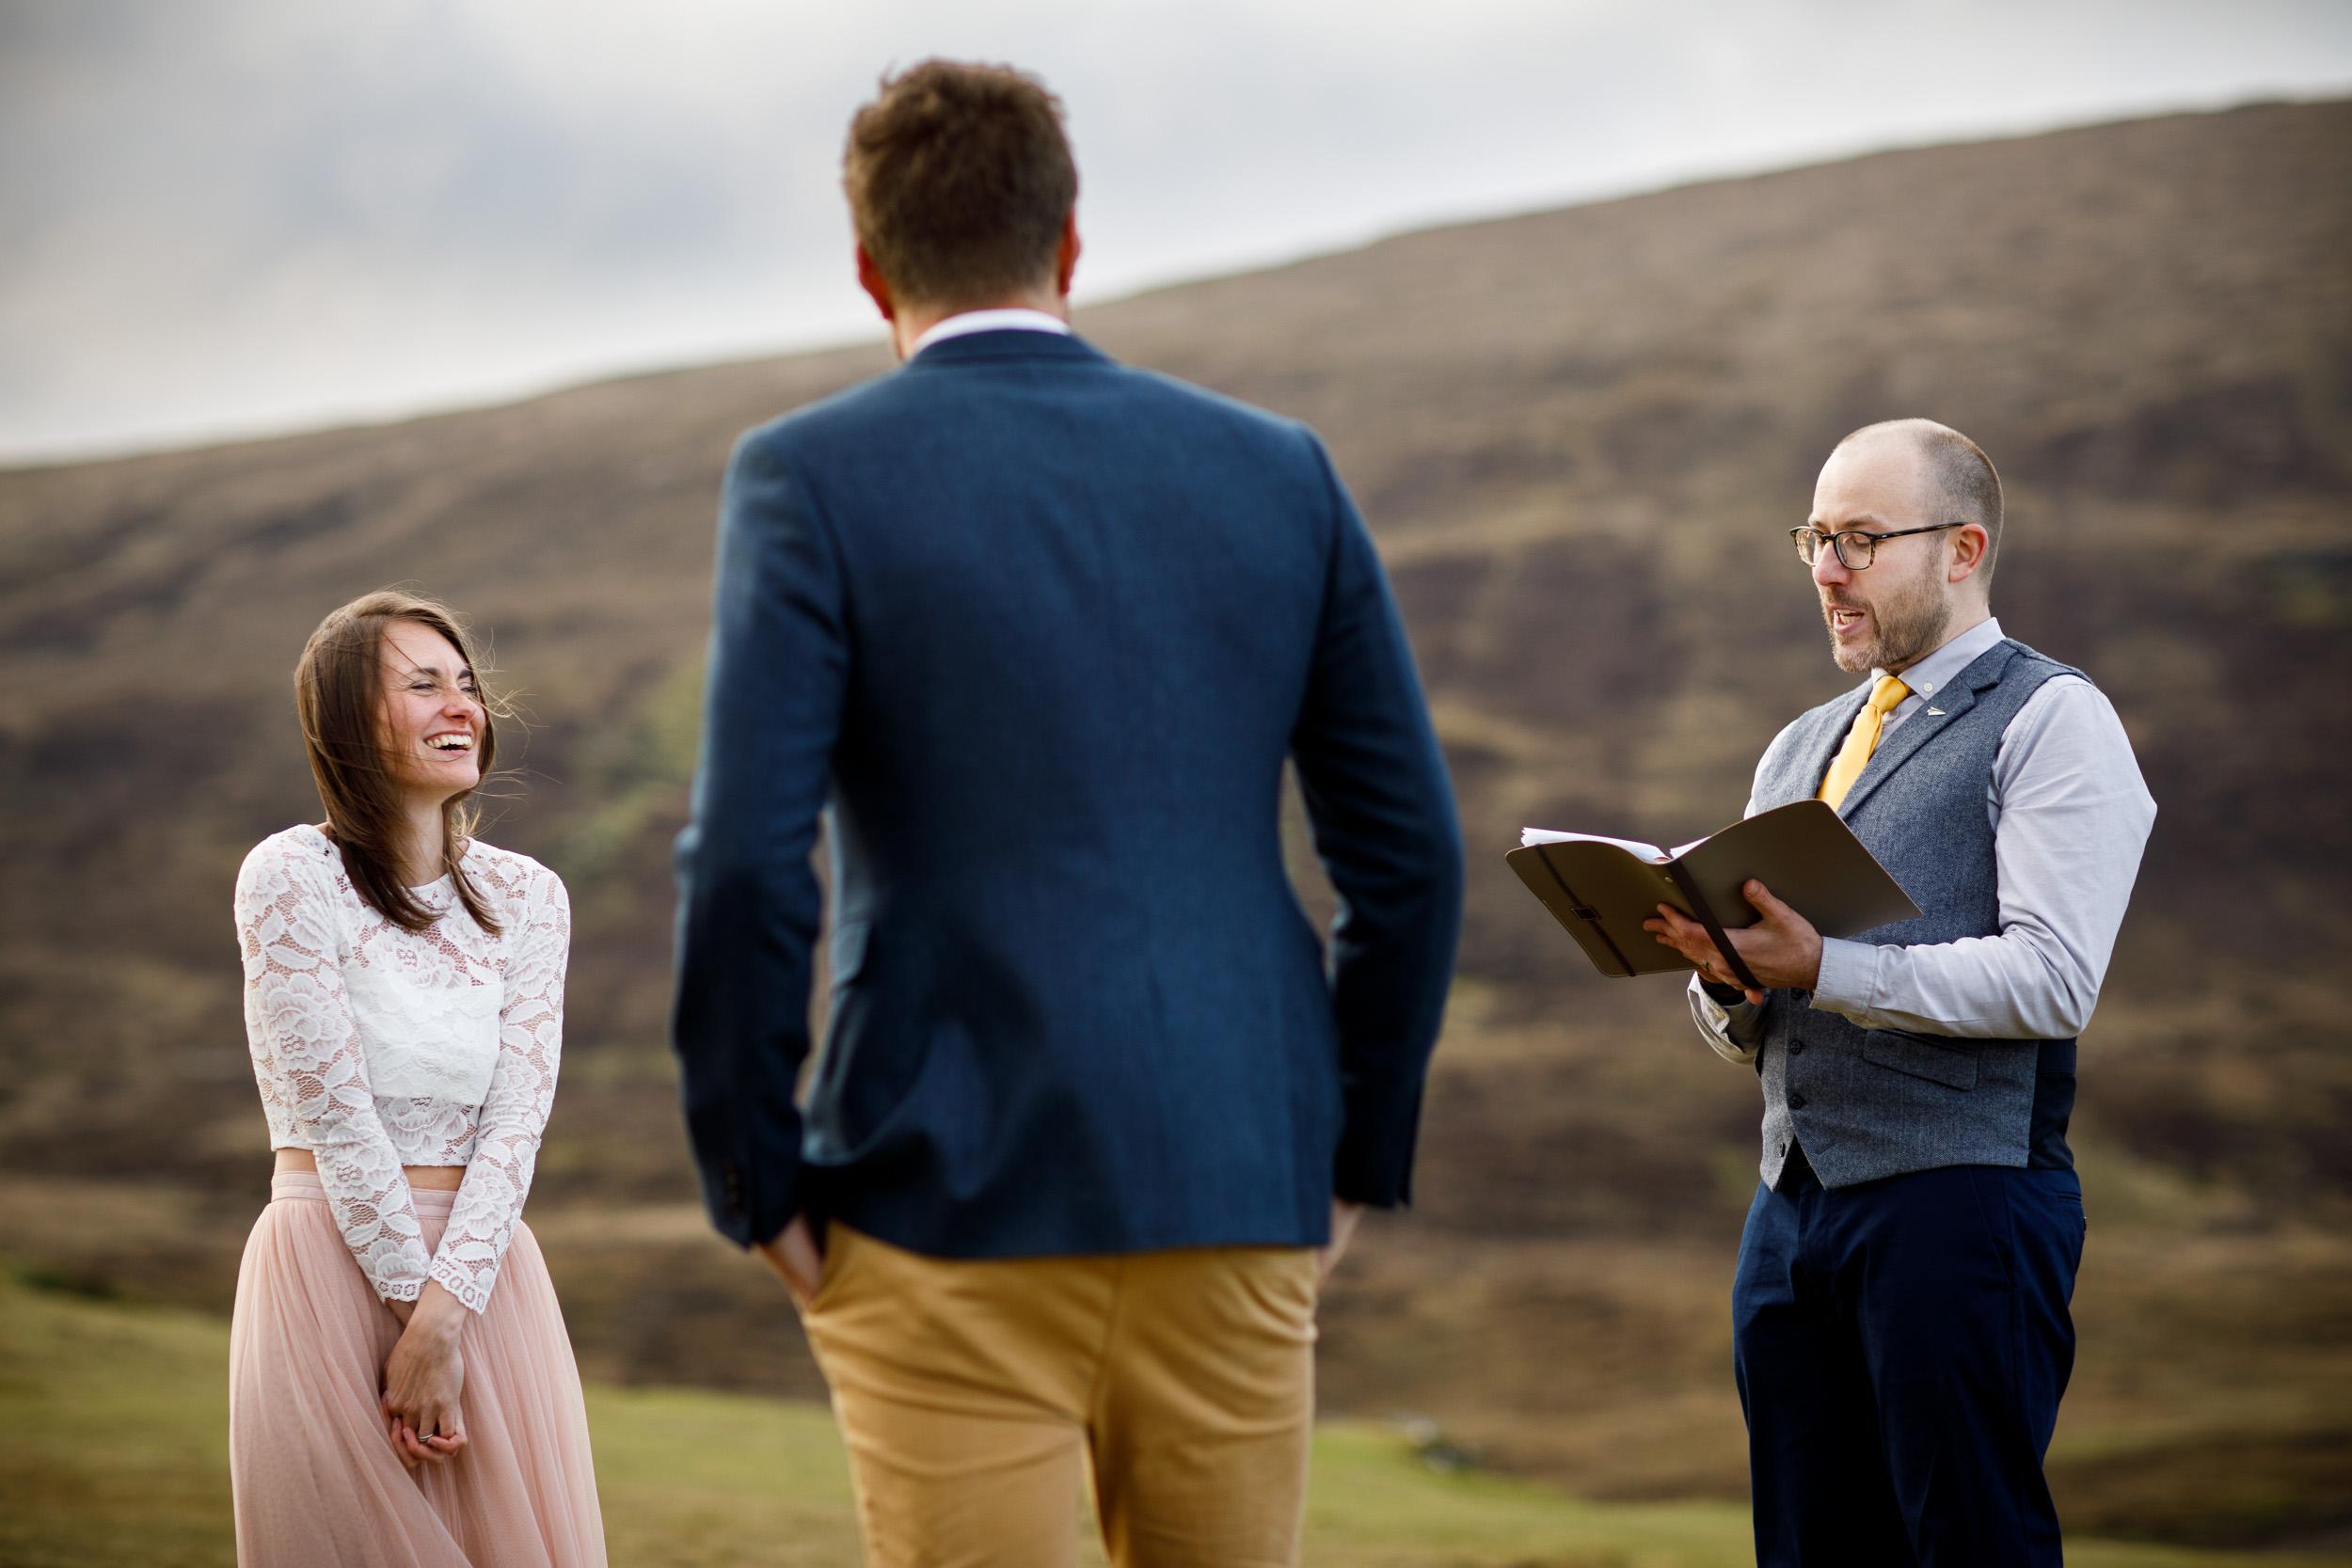 Soph & John, Vow Renewal, Isle of Skye, Scotland. Photo  Caroline-Alexander